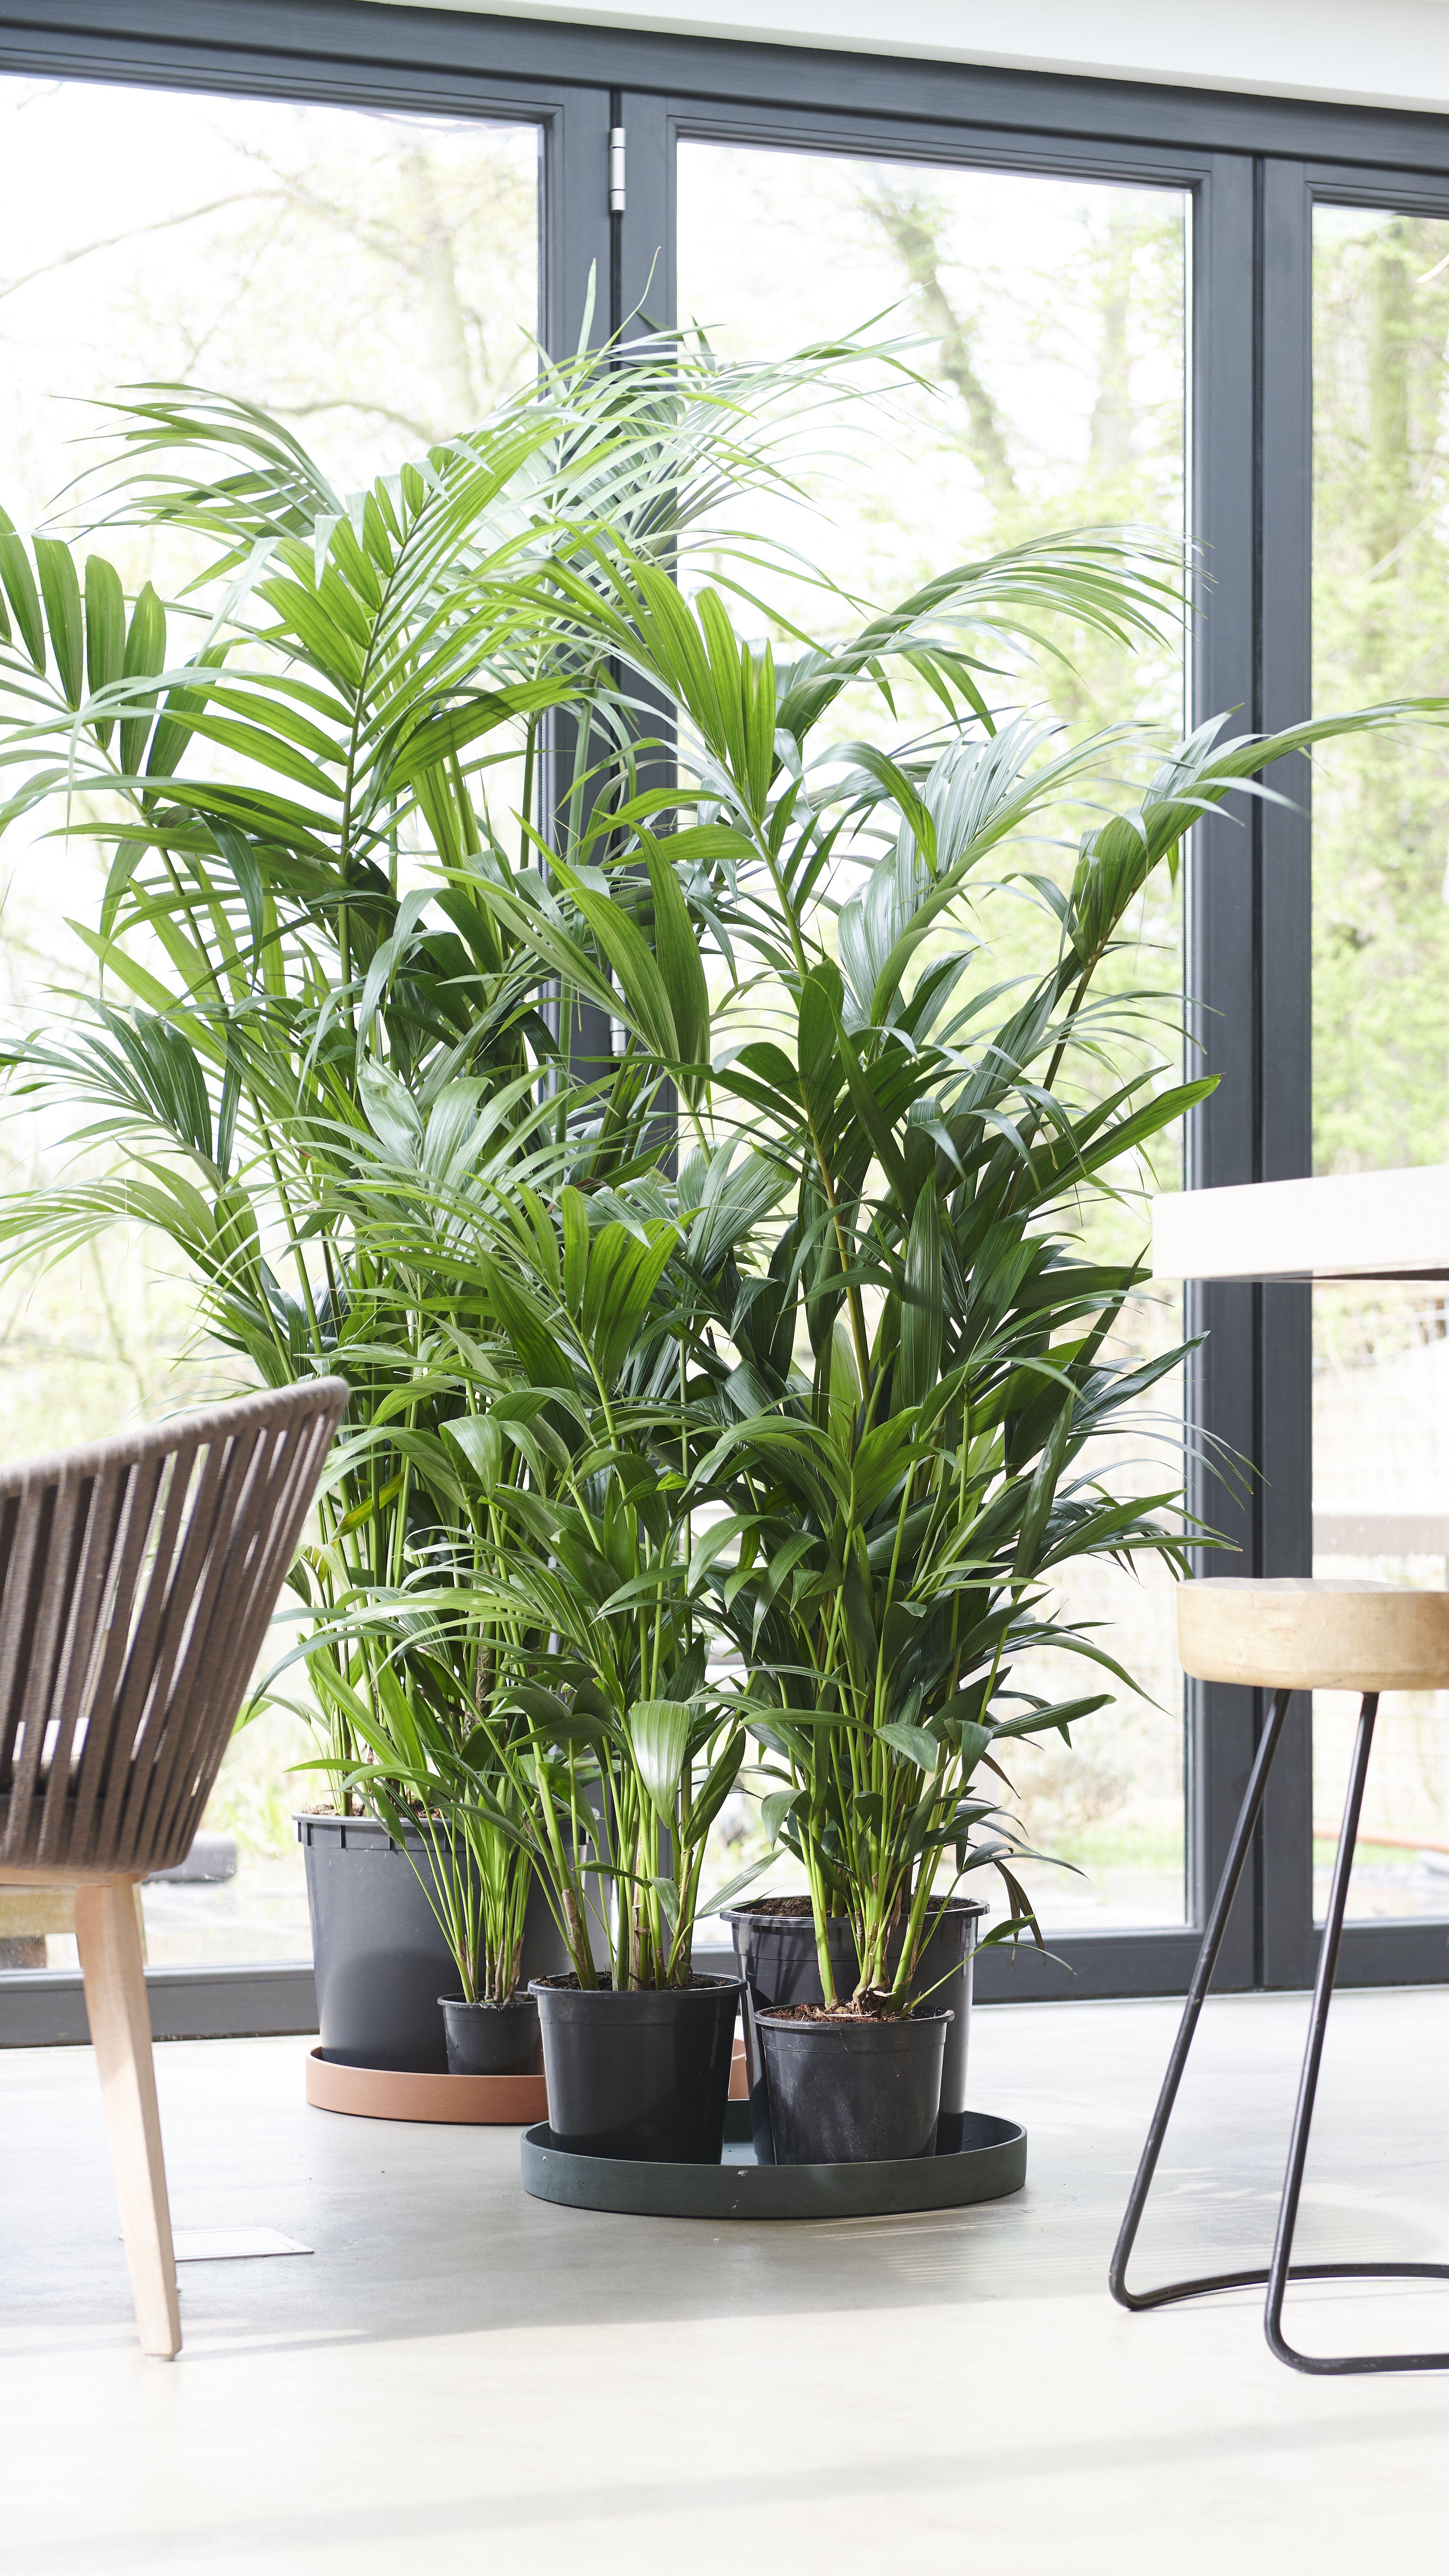 Die Kentia Palme Palmen Zimmerpflanzen Ideen Kentia Palme